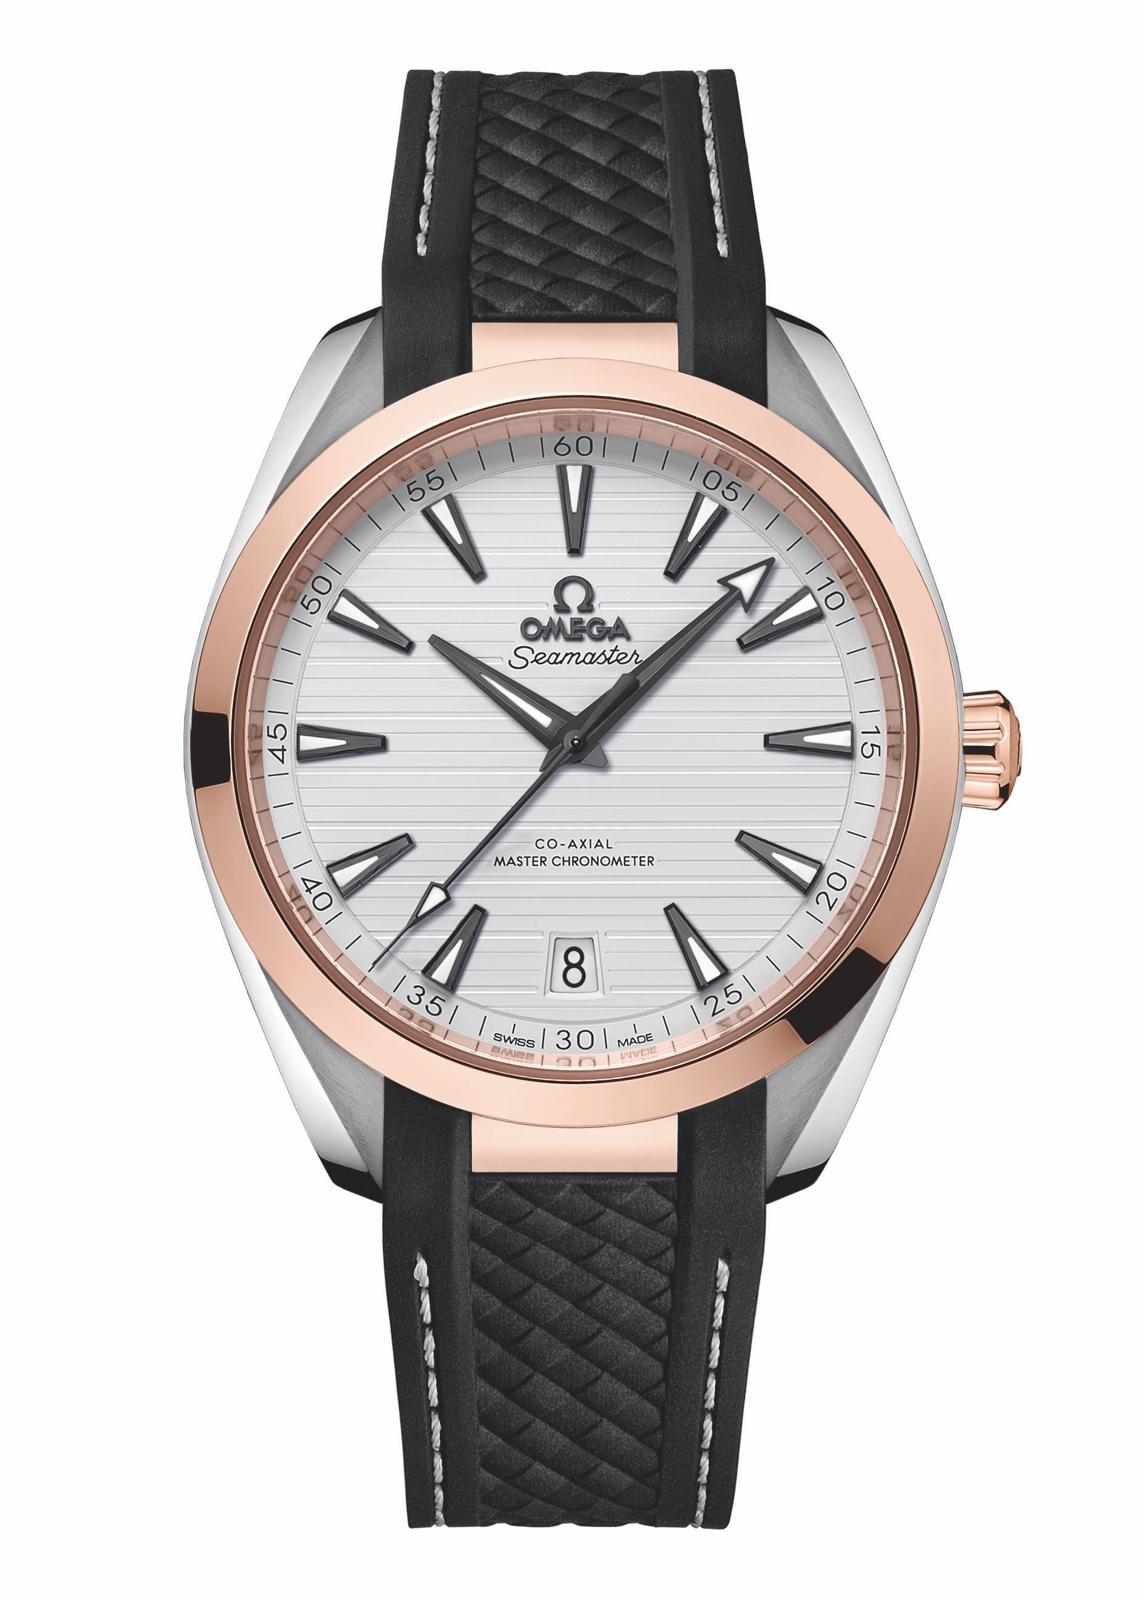 Omega Seamaster Aqua Terra Master Chronometer Sedna Gold Soldat